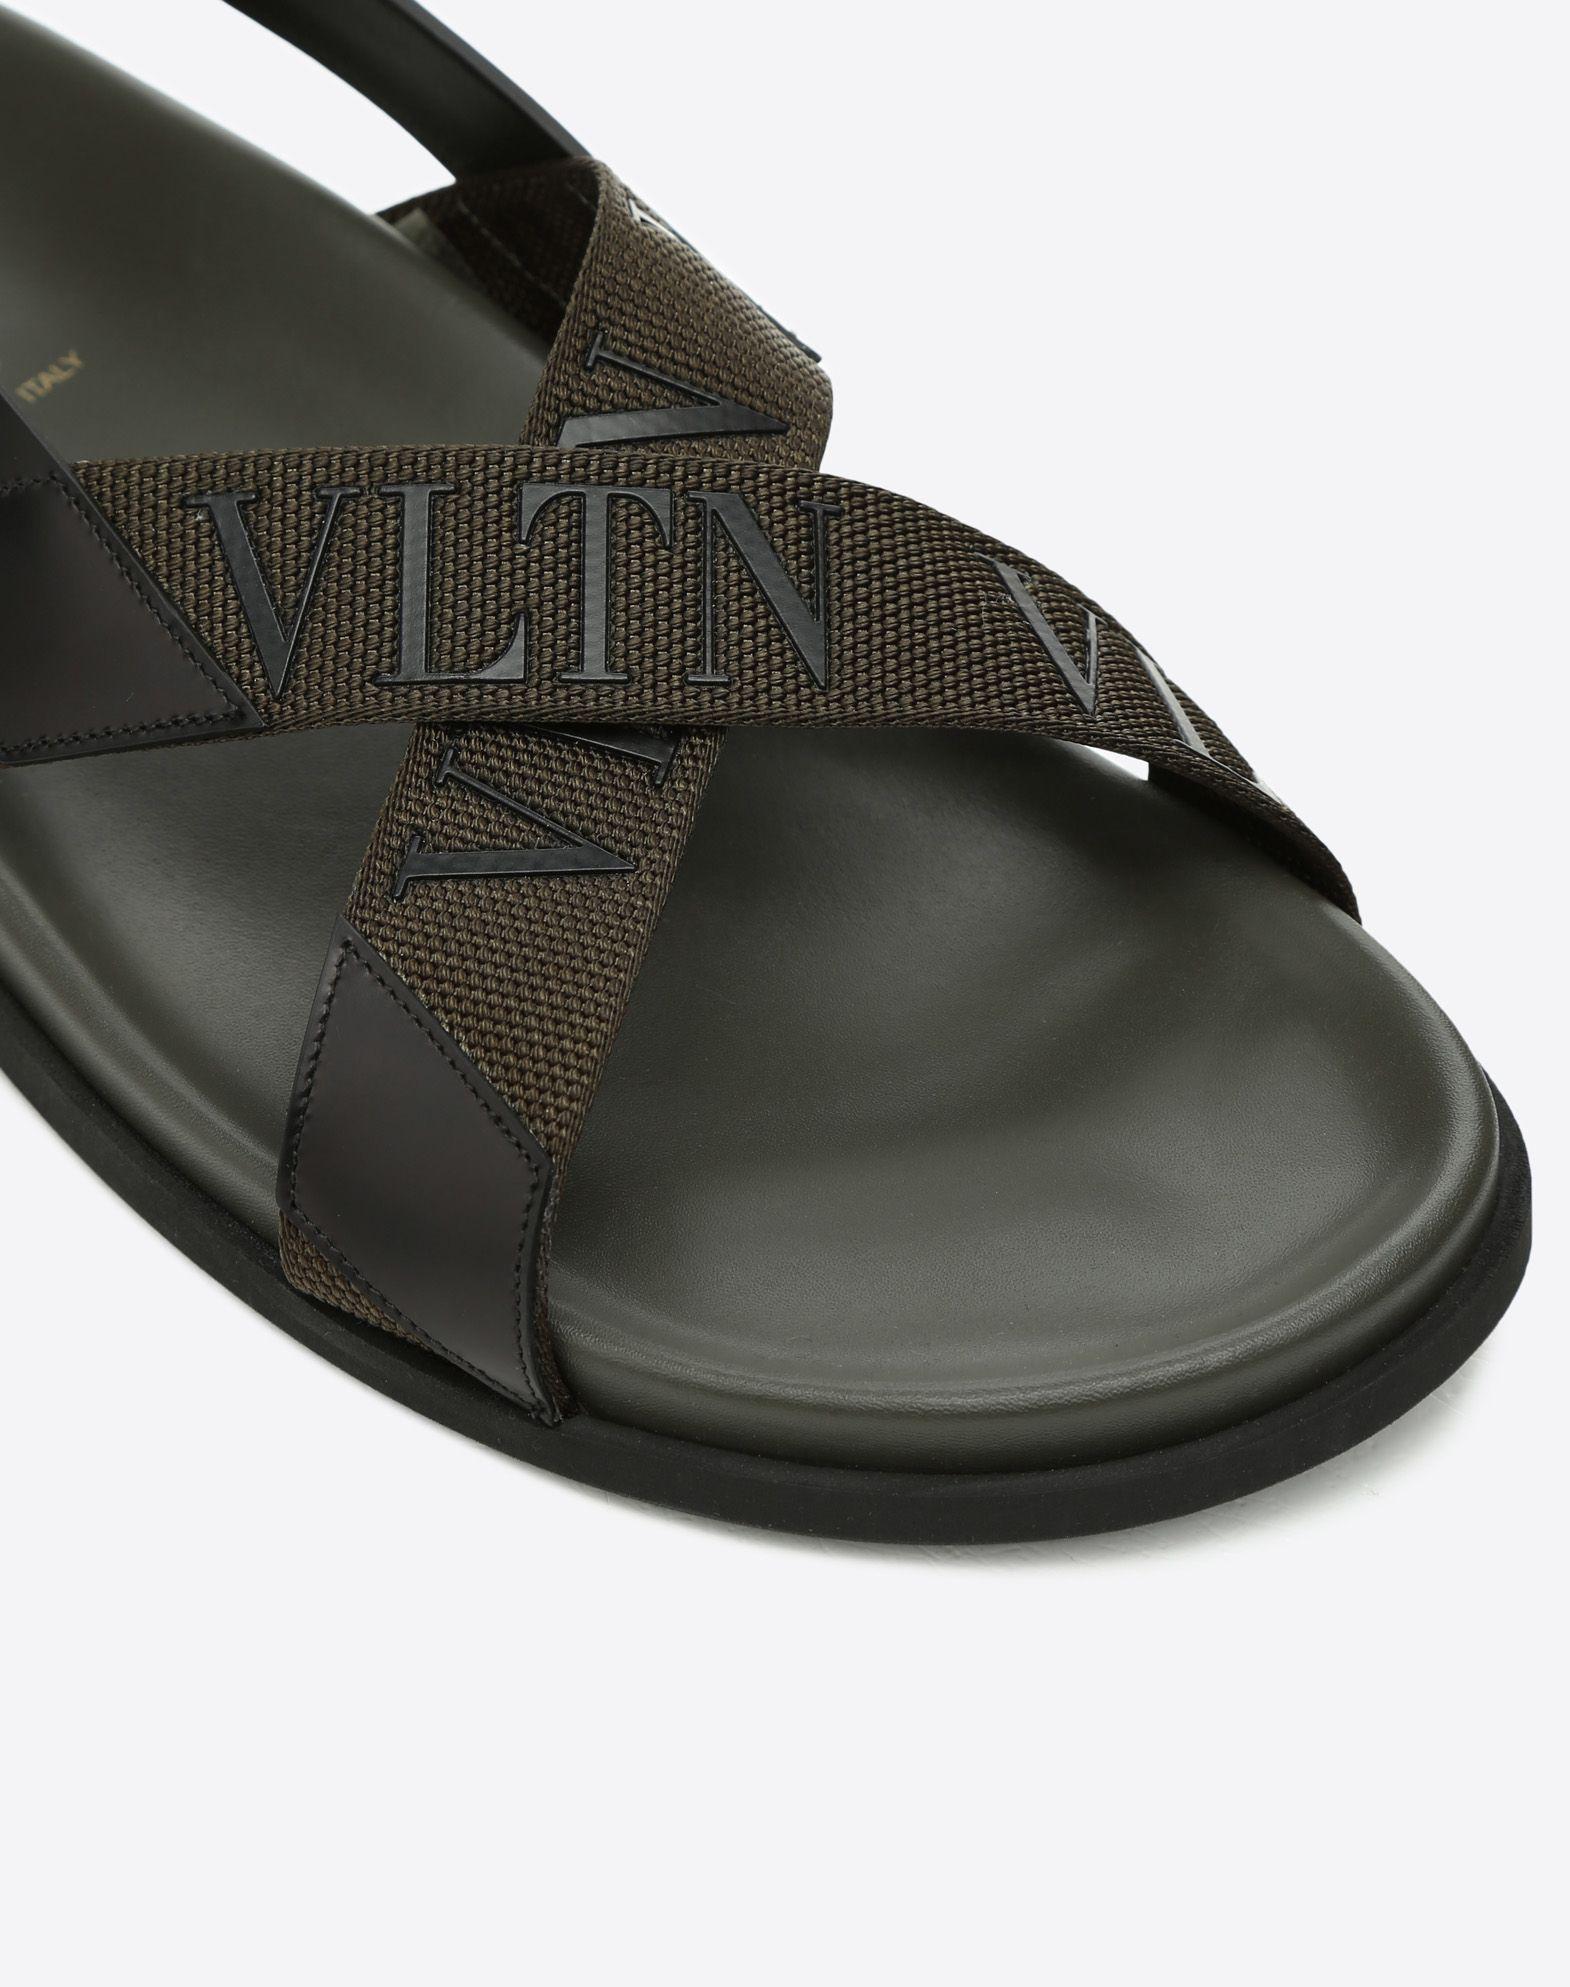 VALENTINO GARAVANI UOMO Low VLTN sandal  FLAT SANDALS U b